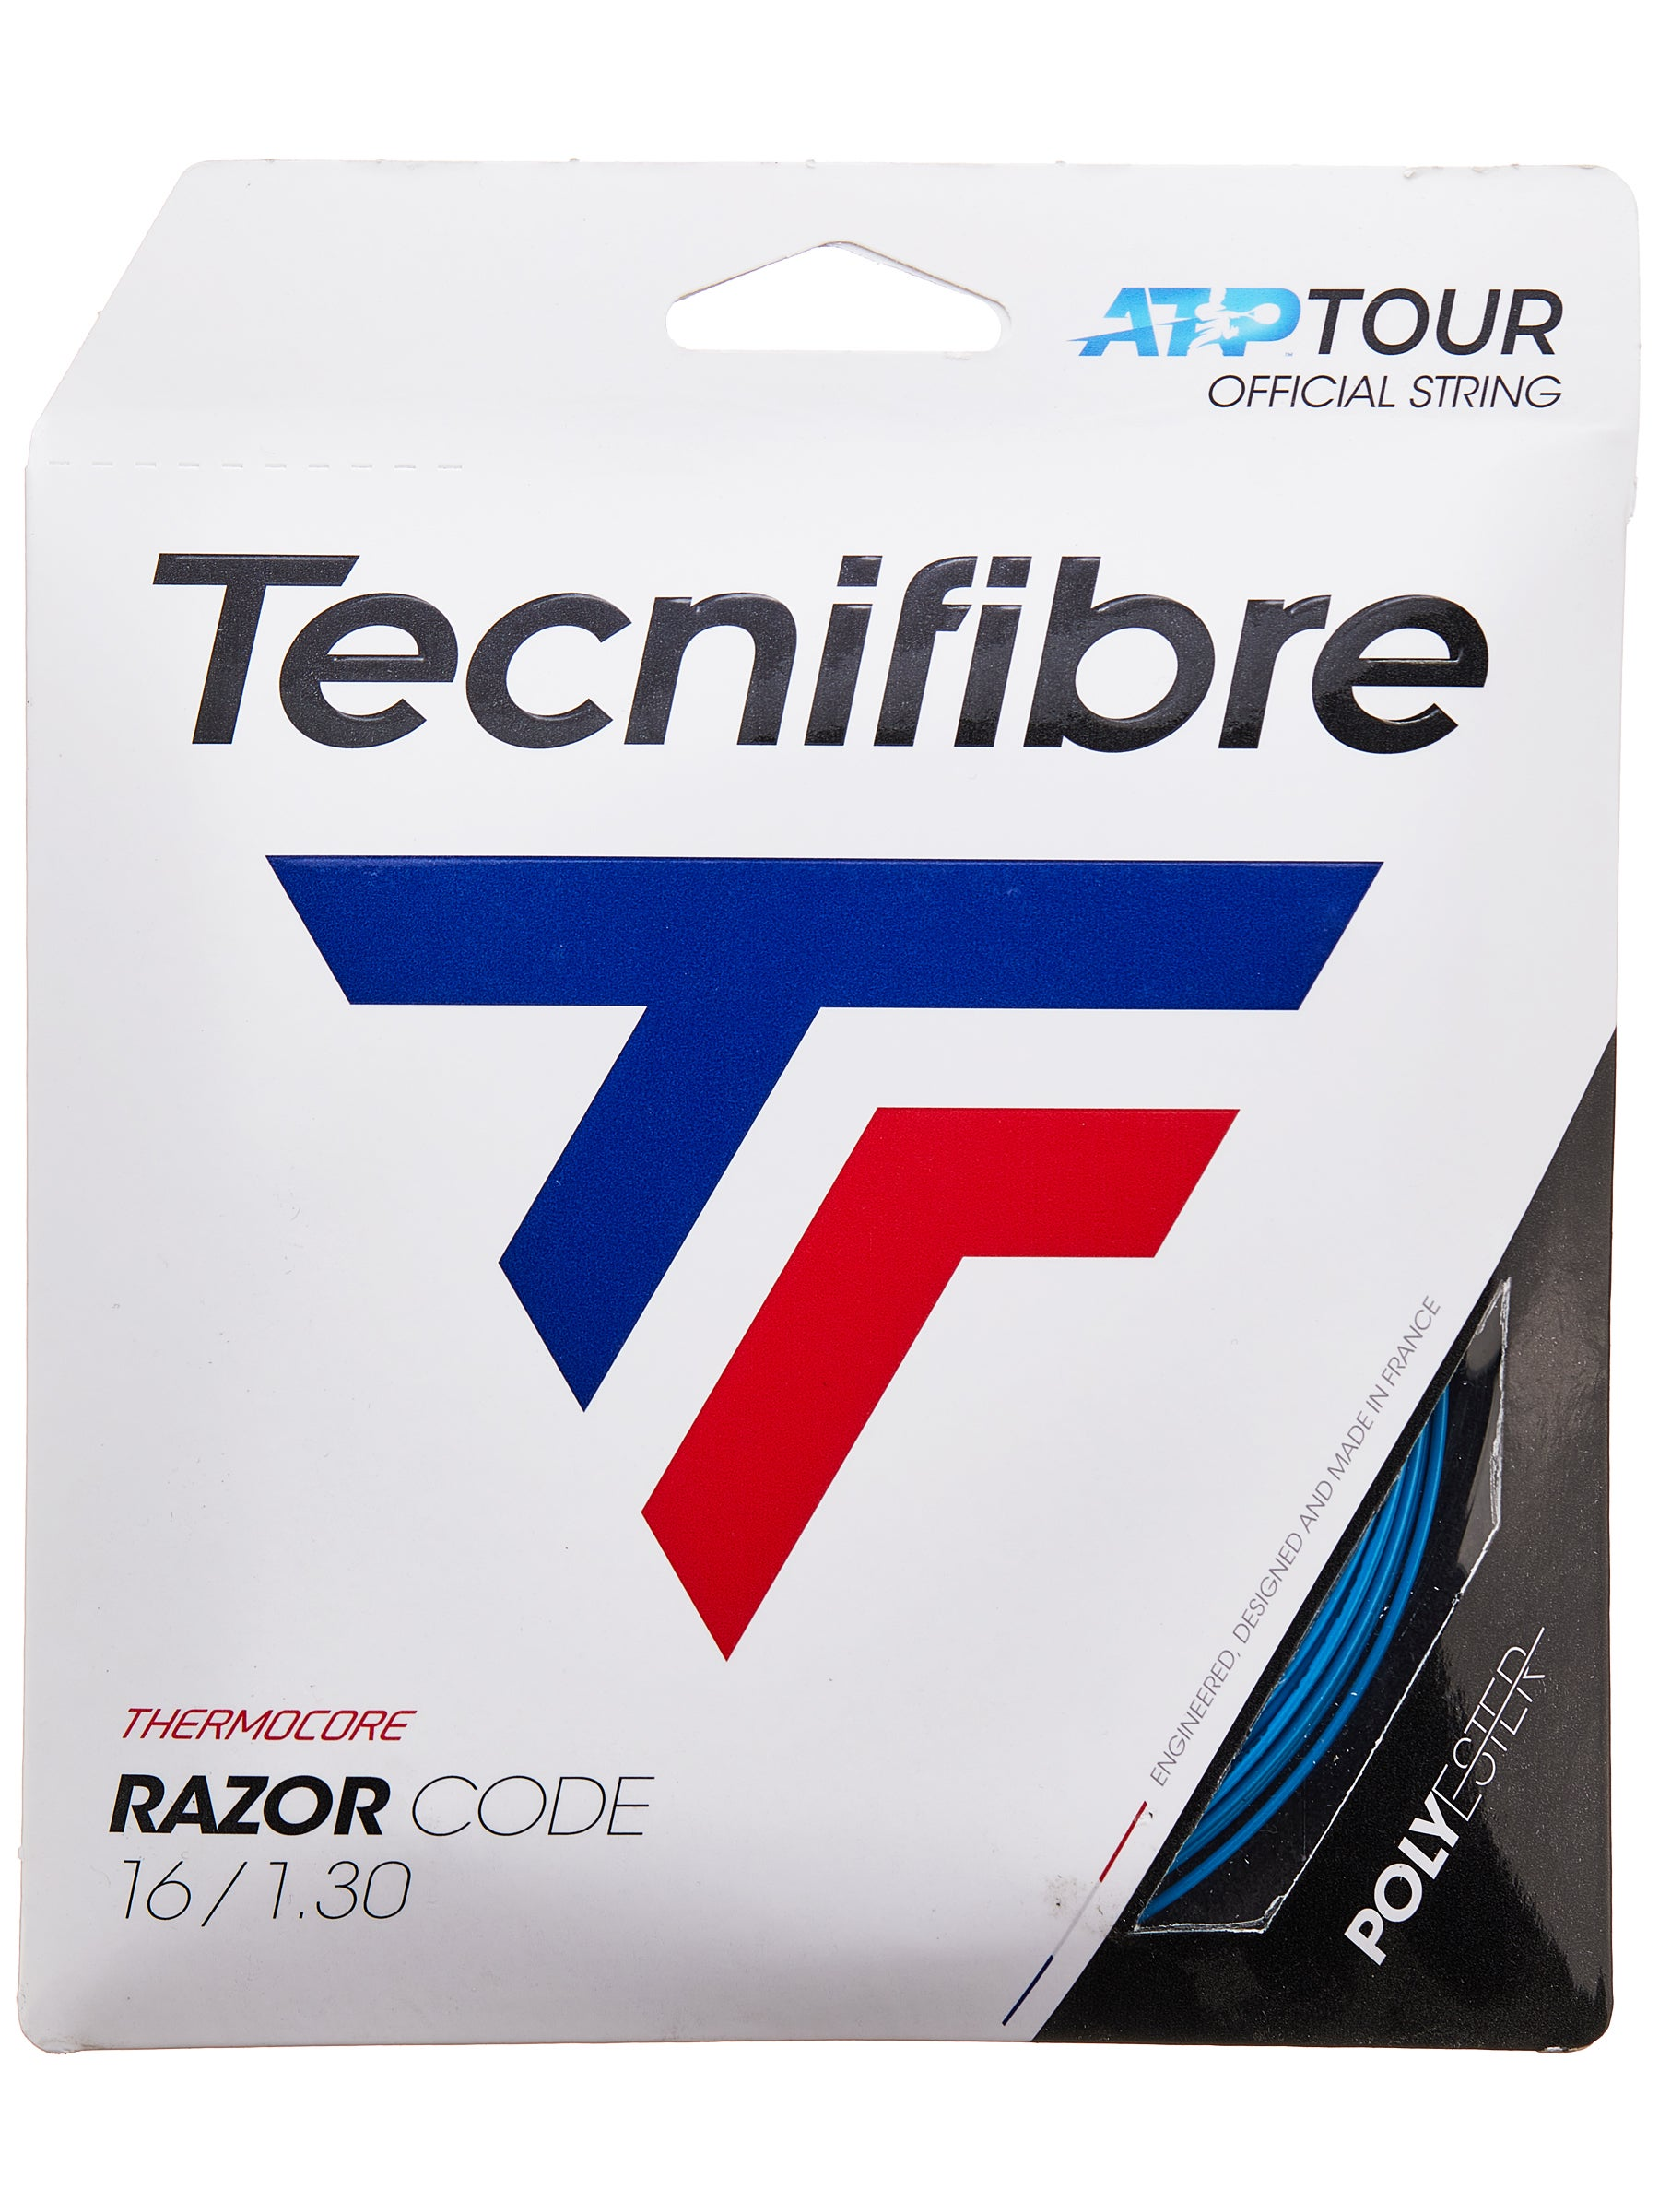 Tecnifibre ATP Razor Code 16 String Carbon